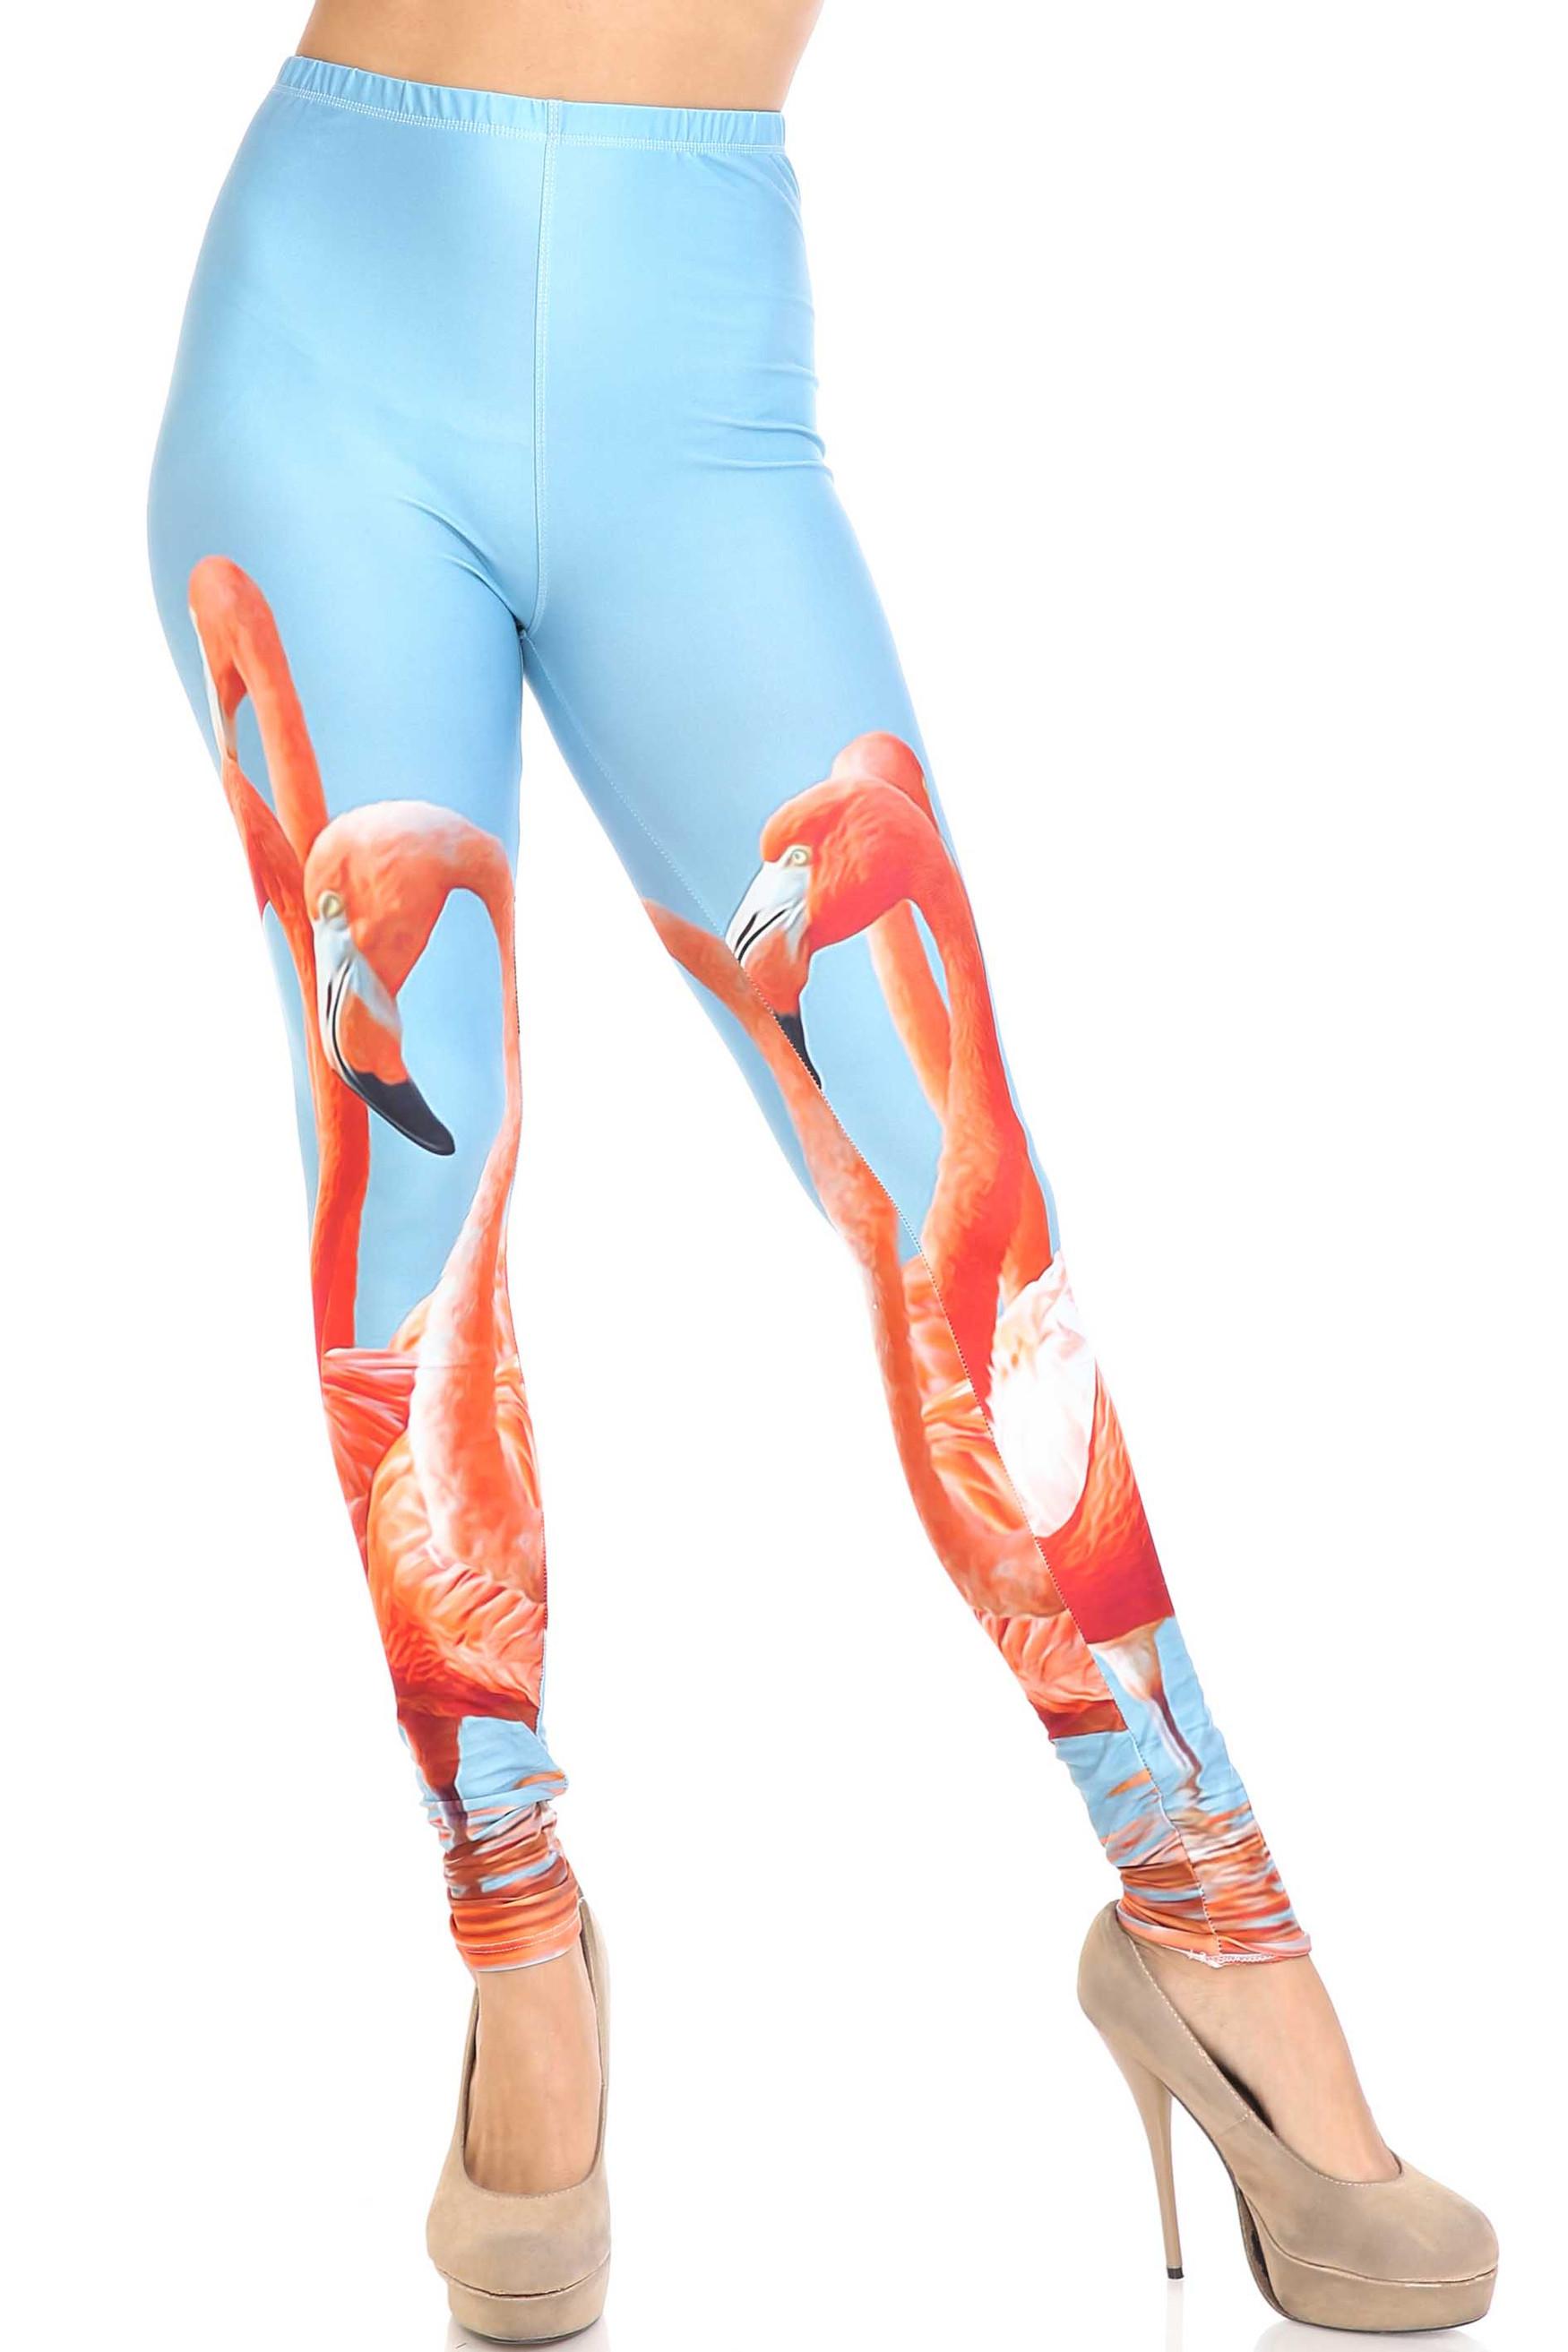 Creamy Soft Flamingo Extra Plus Size Leggings - 3X-5X - USA Fashion™